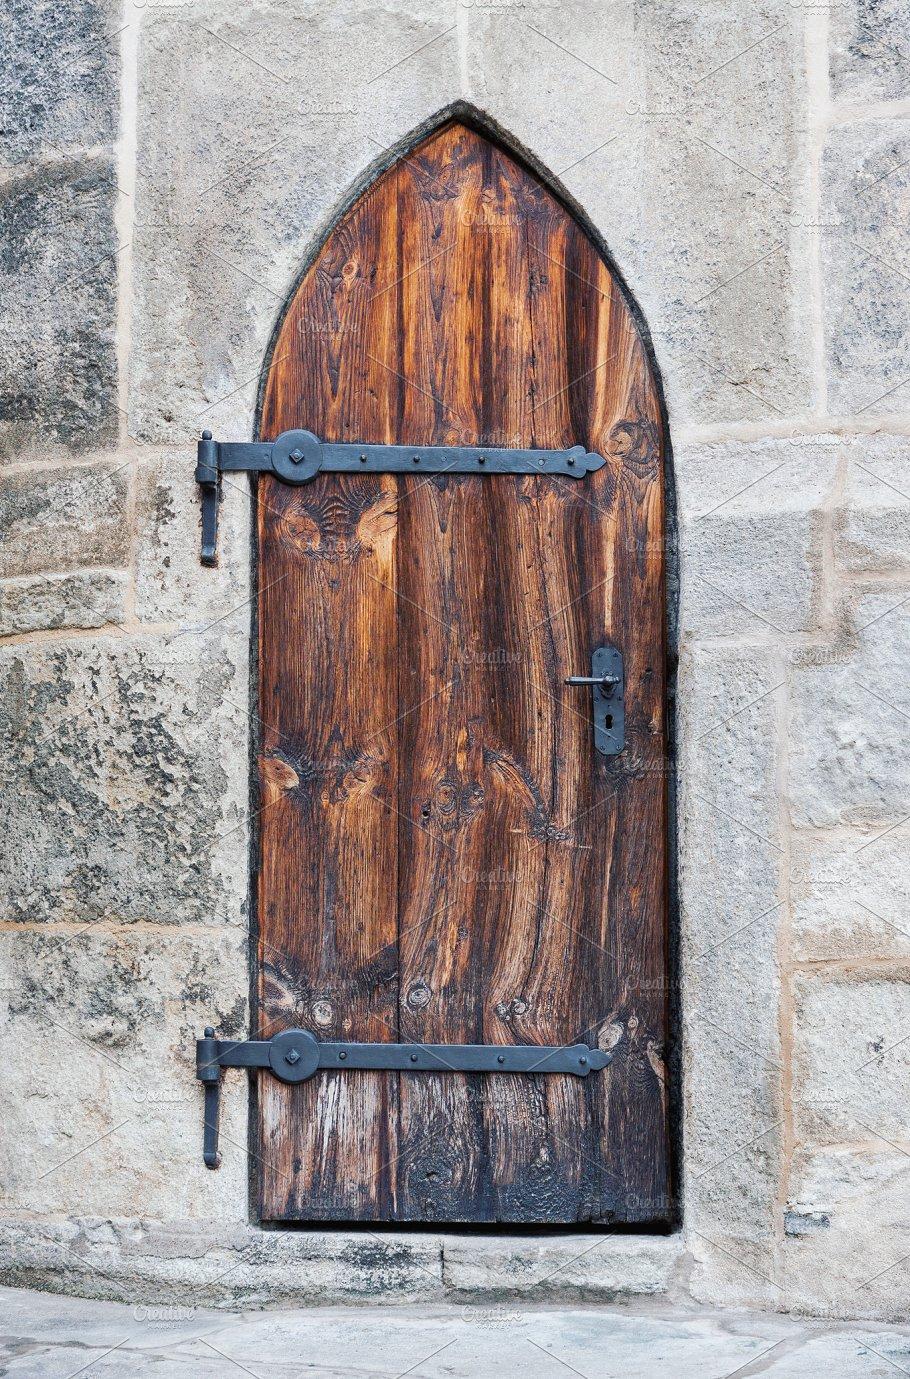 Wooden medieval castle doors ~ Architecture Photos ~ Creative Market